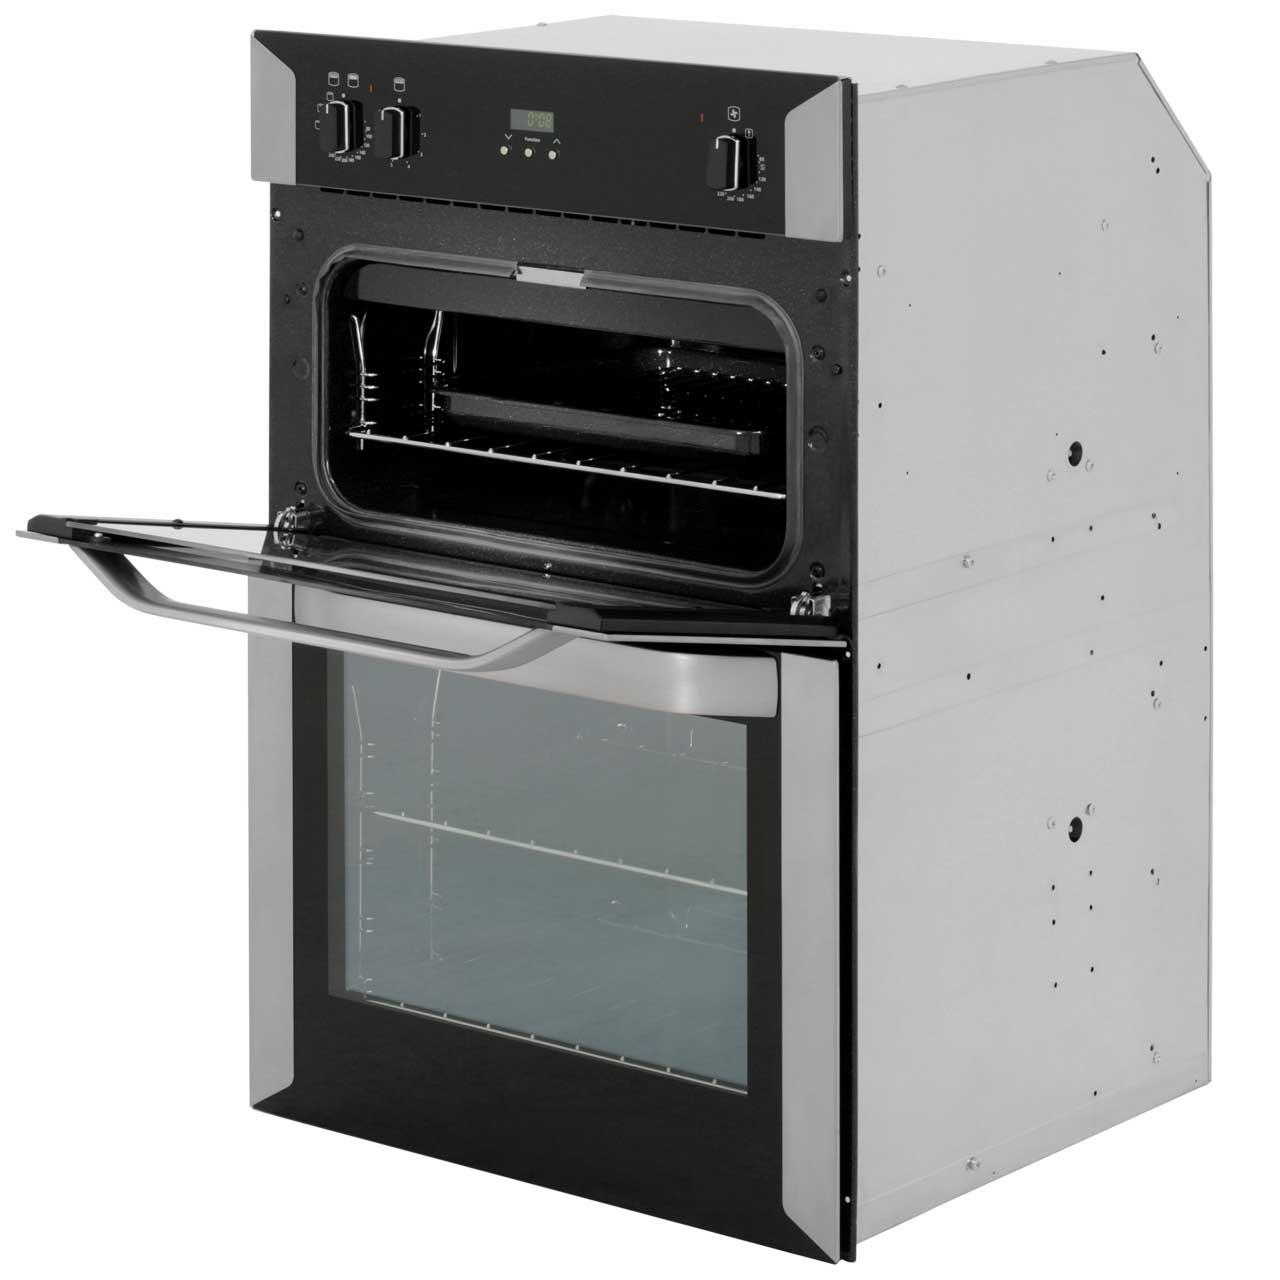 belling bi90fp built in 60cm electric double oven stainless steel new 5034648495909 ebay. Black Bedroom Furniture Sets. Home Design Ideas